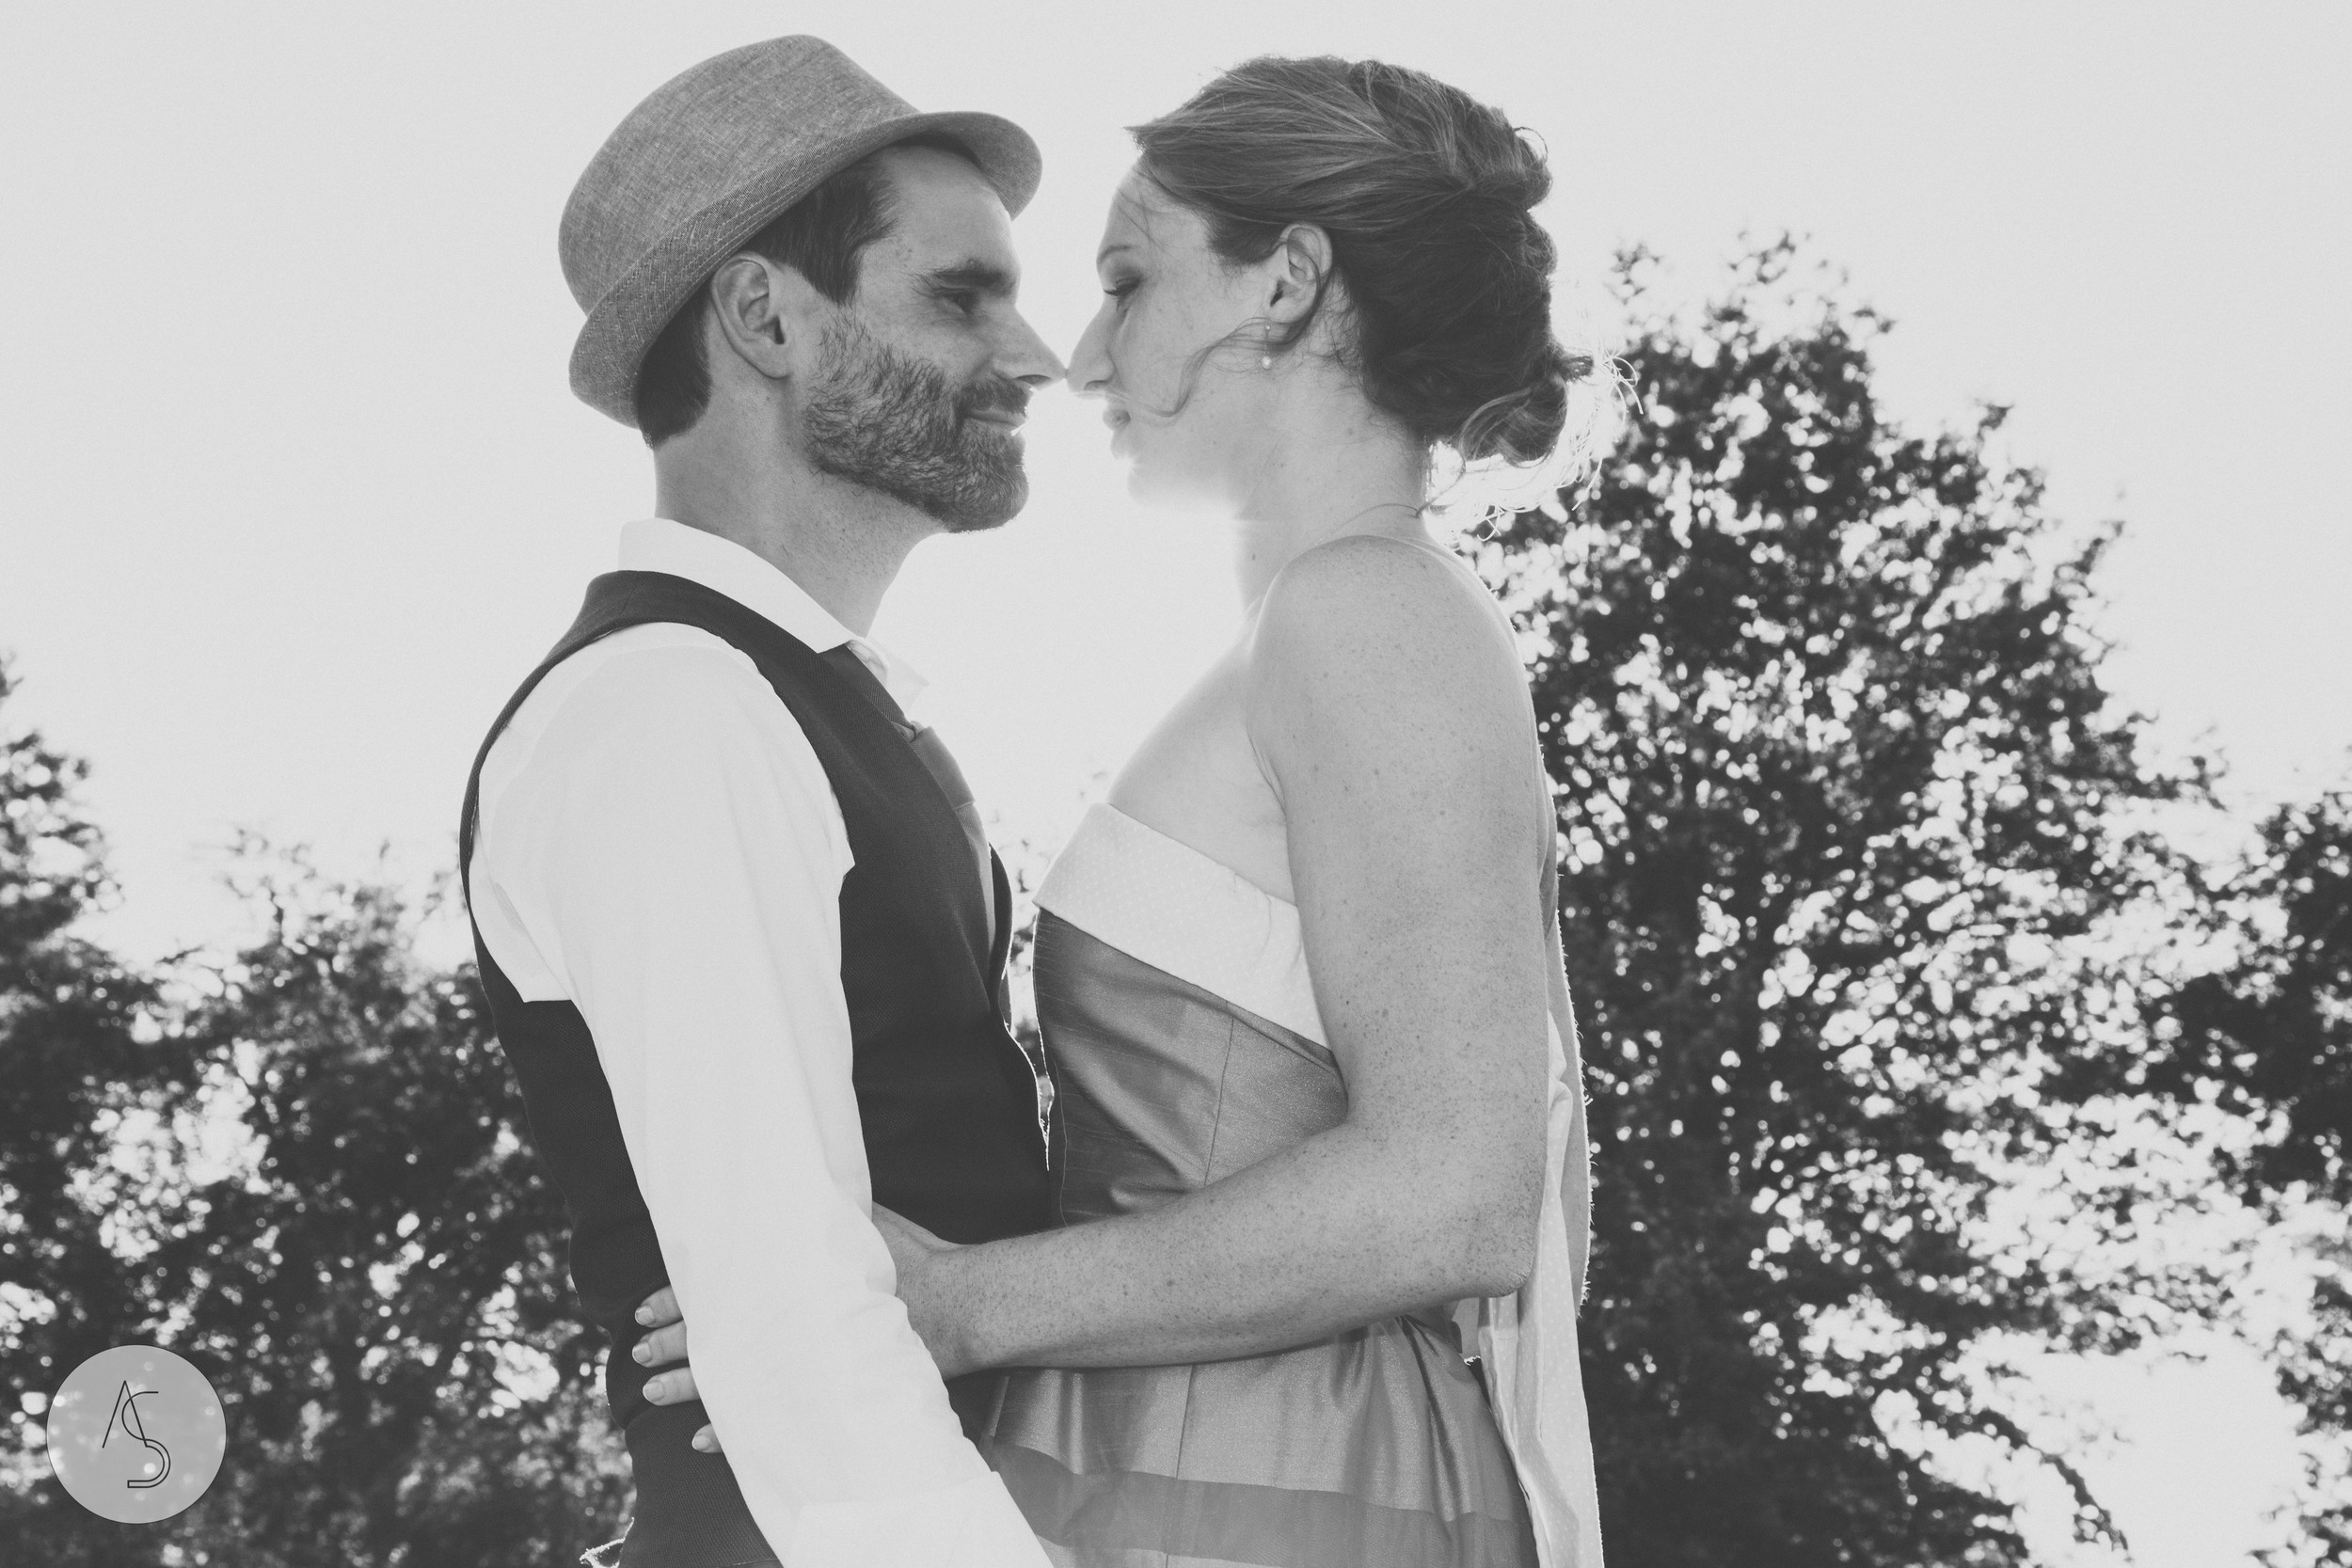 photographe mariage - Grenoble - Rhone Alpes - Adriana Salazar photo-101.jpg